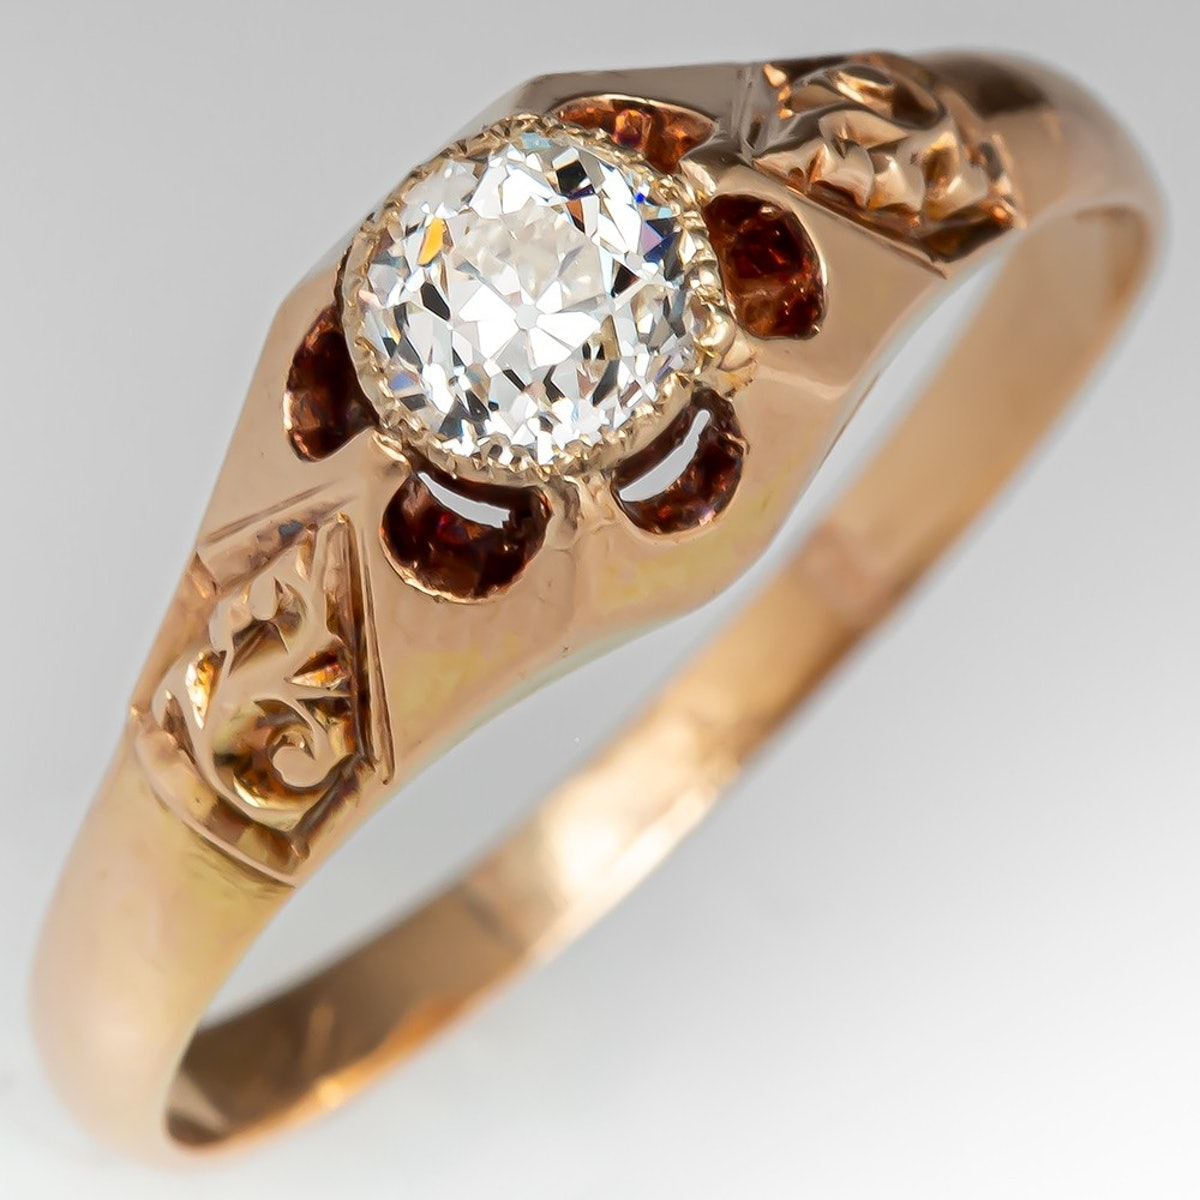 1900 Antique Diamond Solitaire Engagement Ring